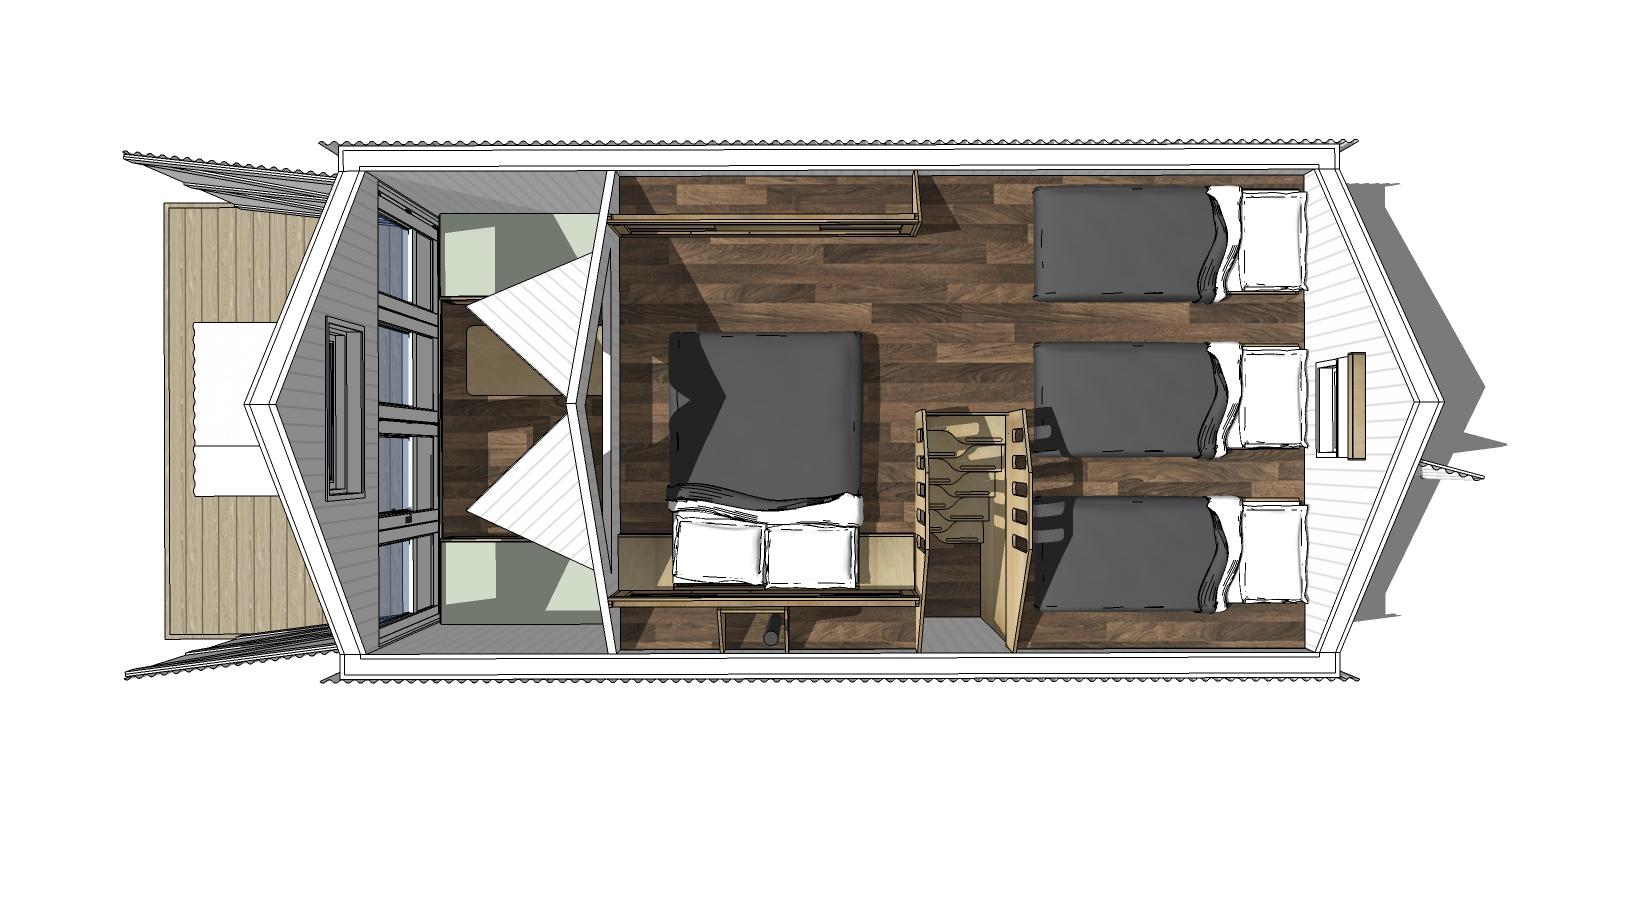 cadland estate 2x huts - 4.jpg